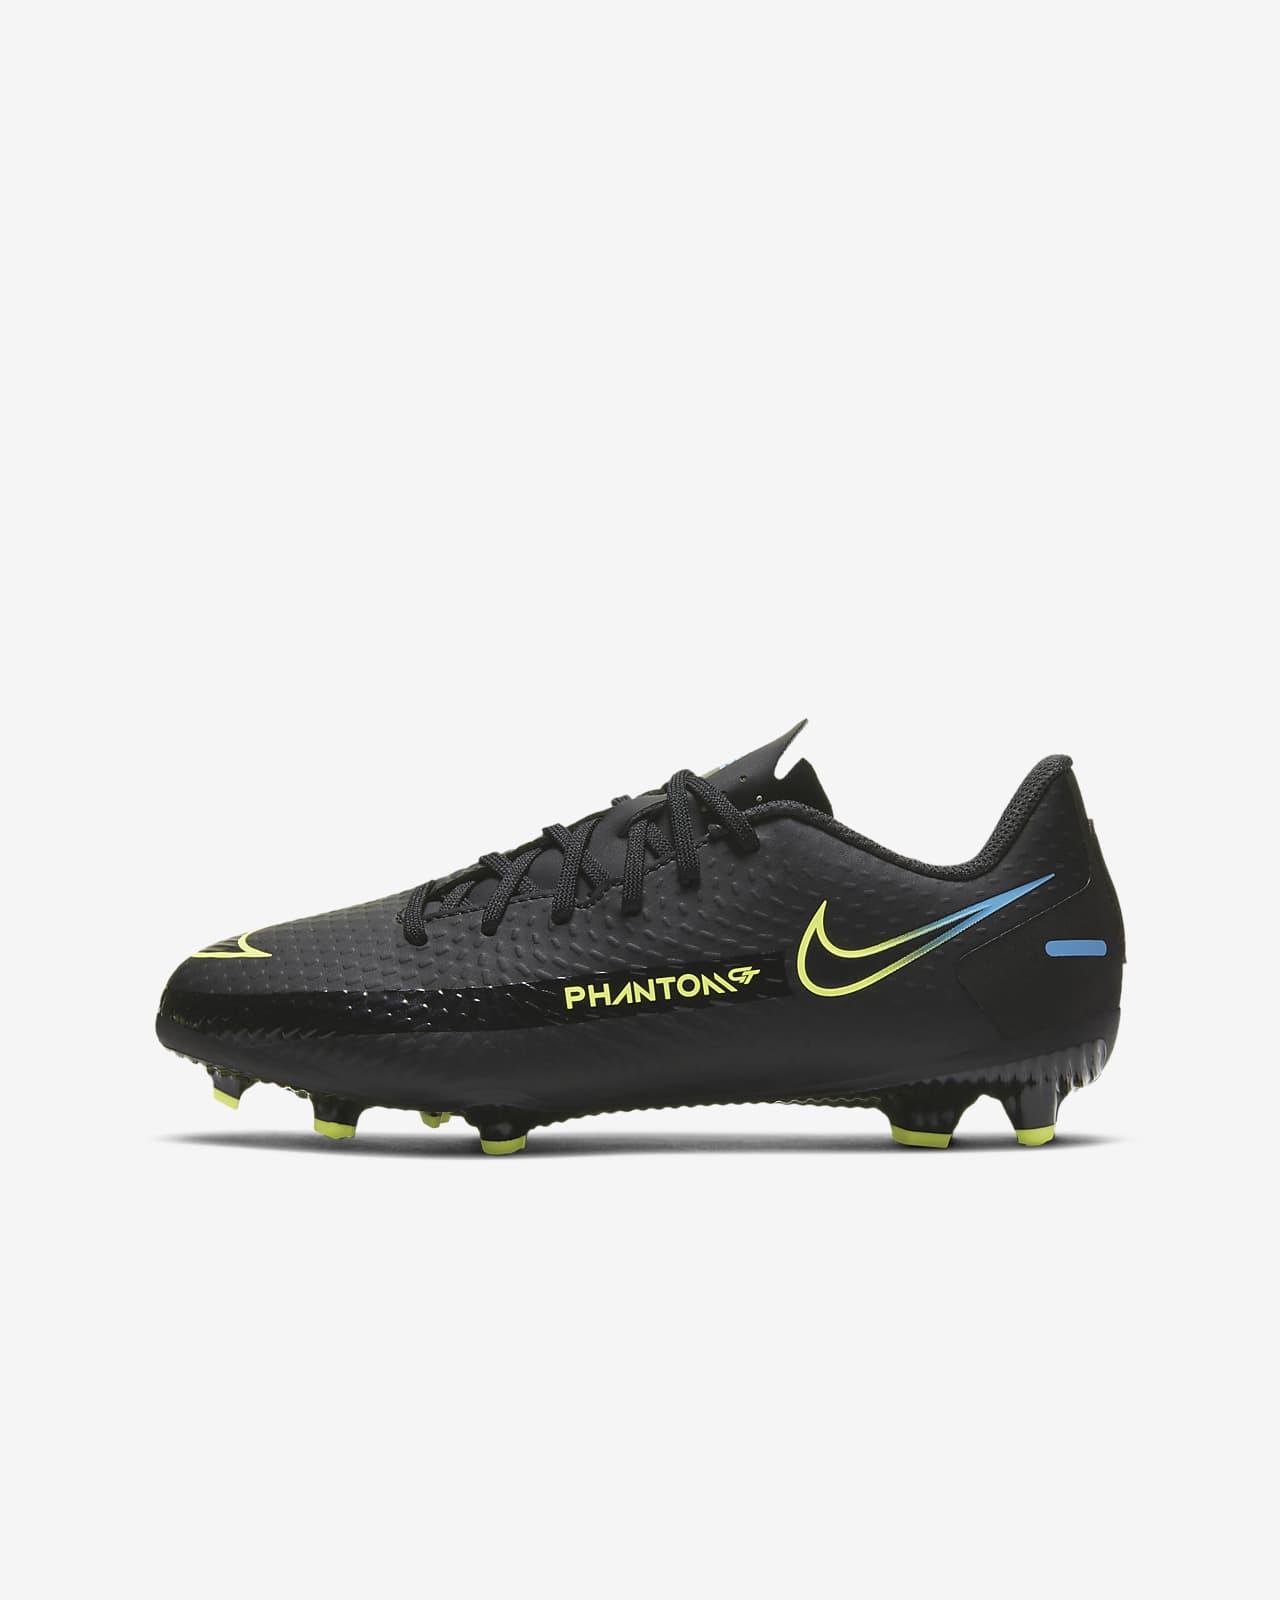 Nike Jr. Phantom GT Academy MG Little/Big Kids' Multi-Ground Soccer Cleat